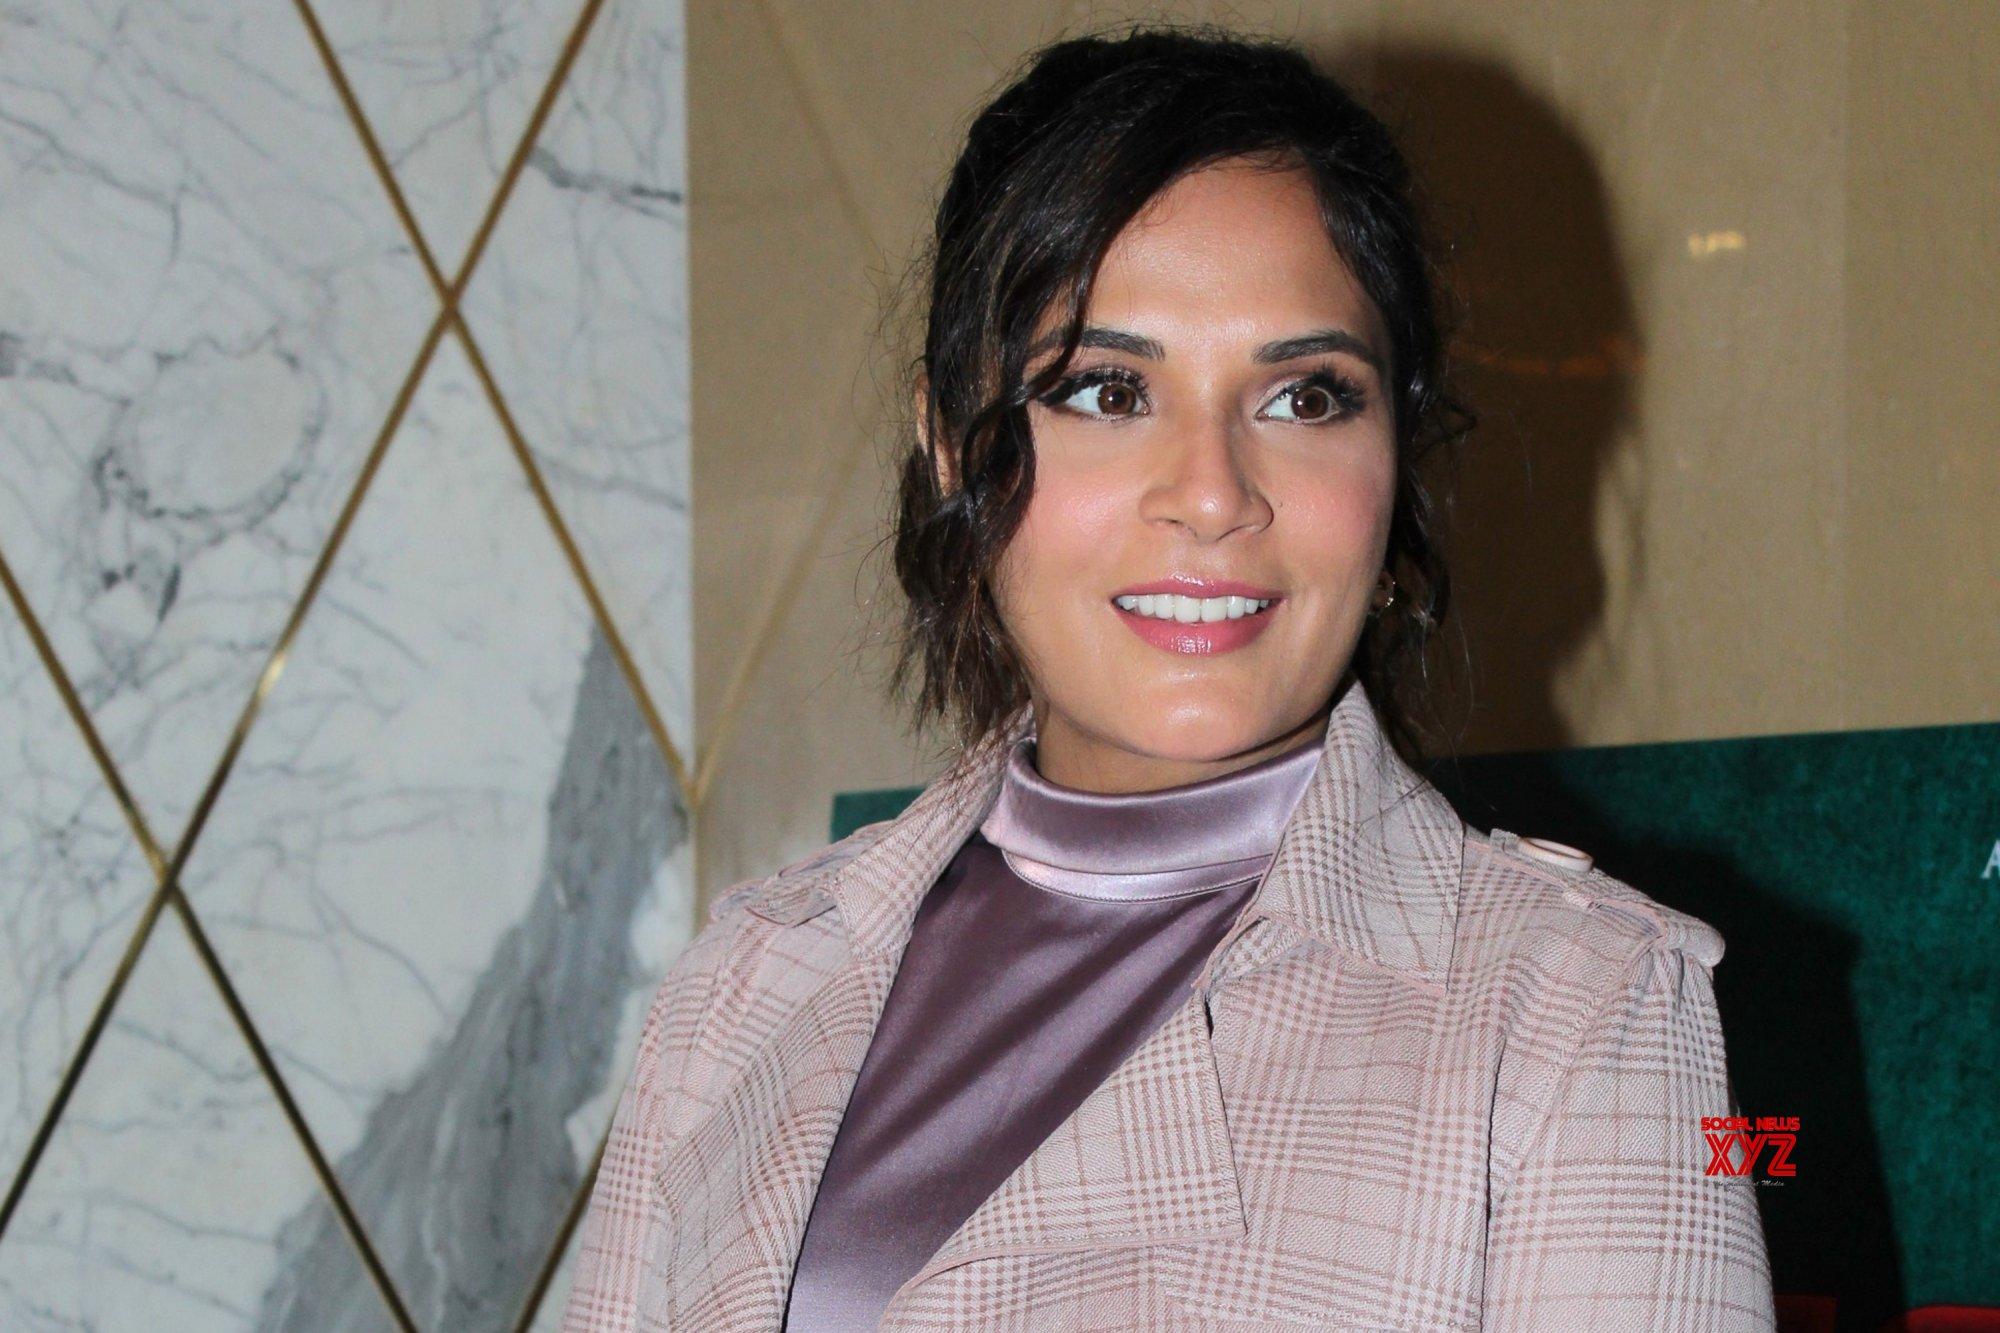 Richa, Akshaye kept minimum interaction on 'Section 375' set